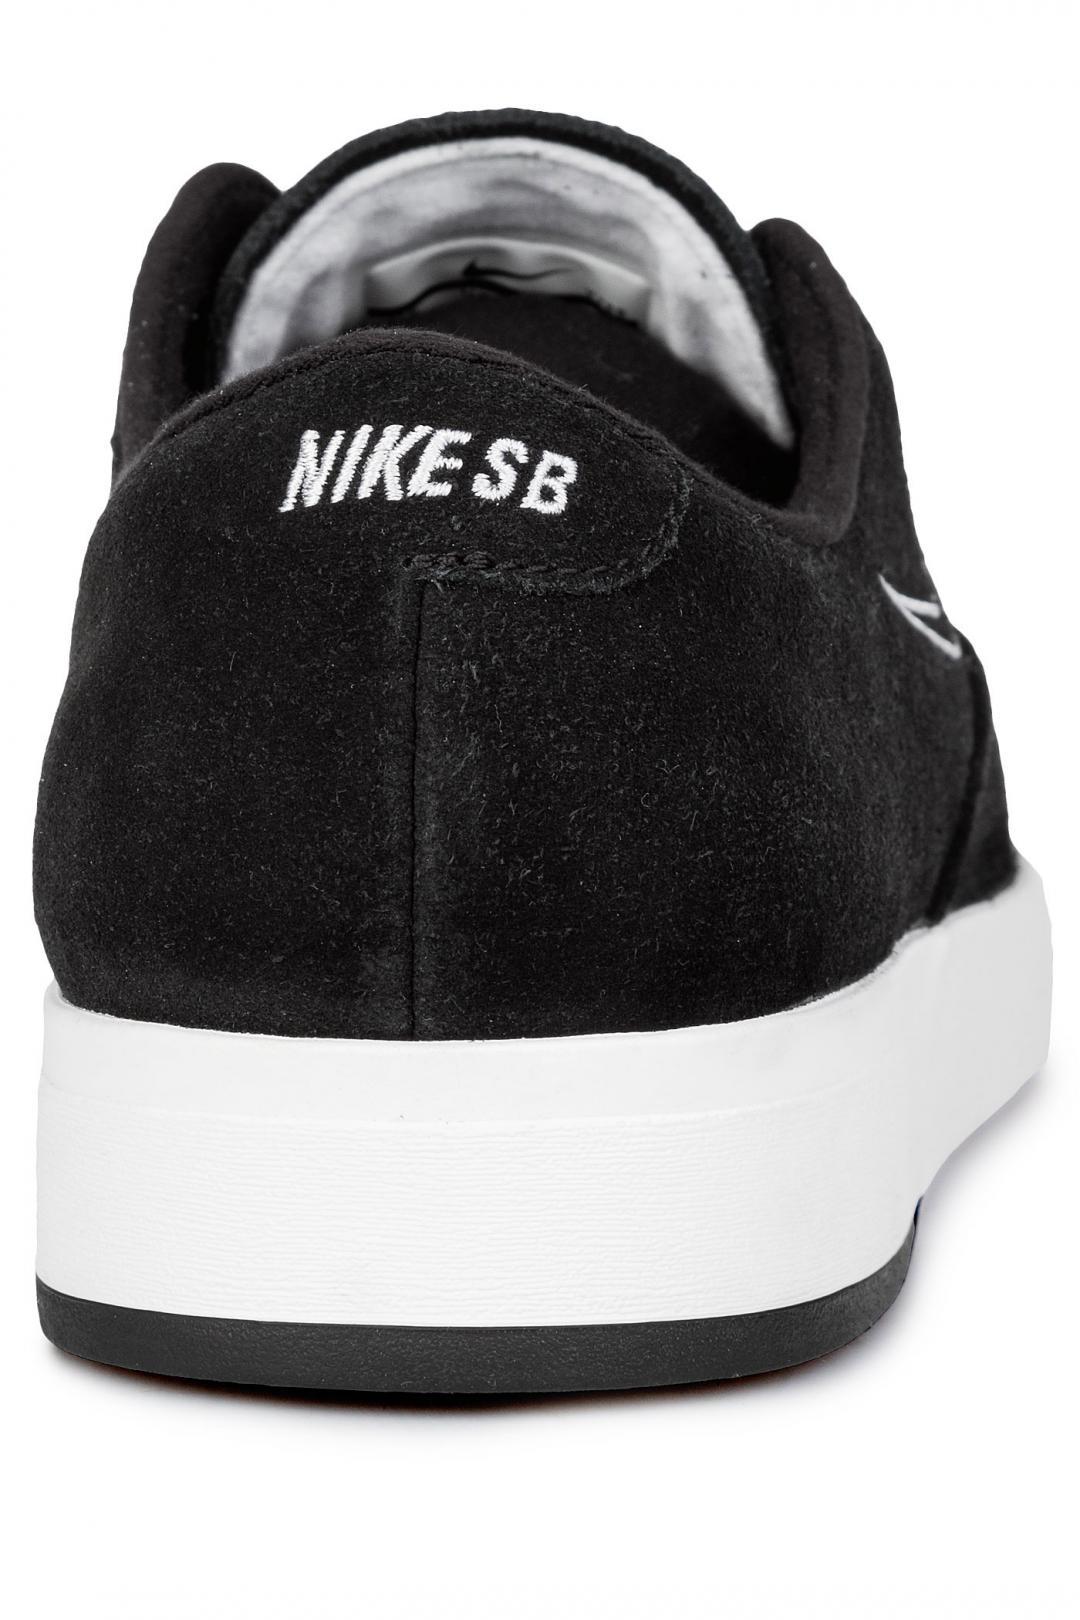 Uomo Nike SB Zoom P-Rod X black black white   Sneakers low top